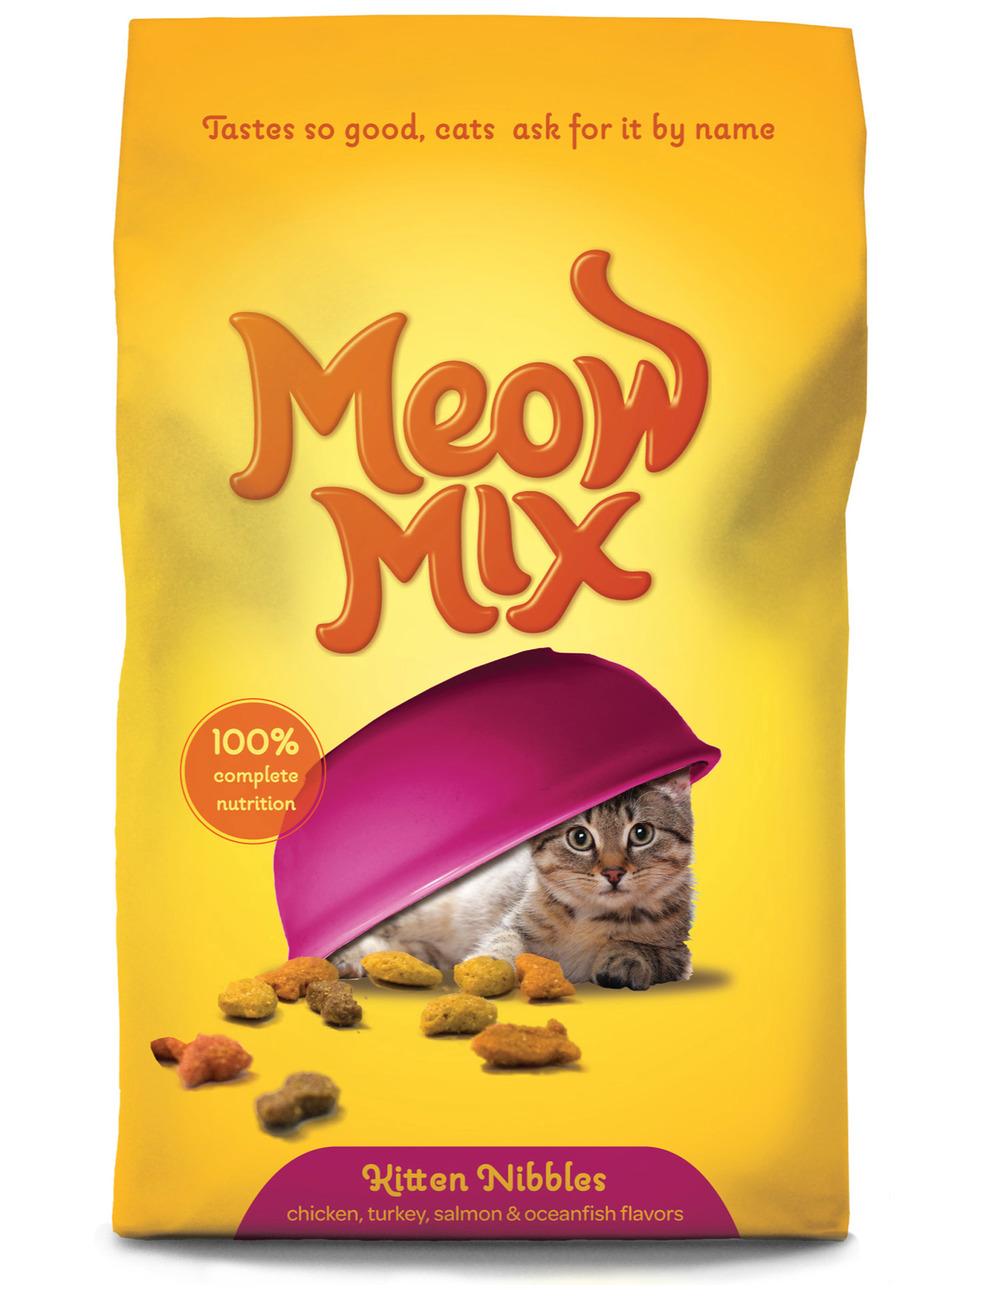 5499_Meow_Preso_Curiosity1.jpg